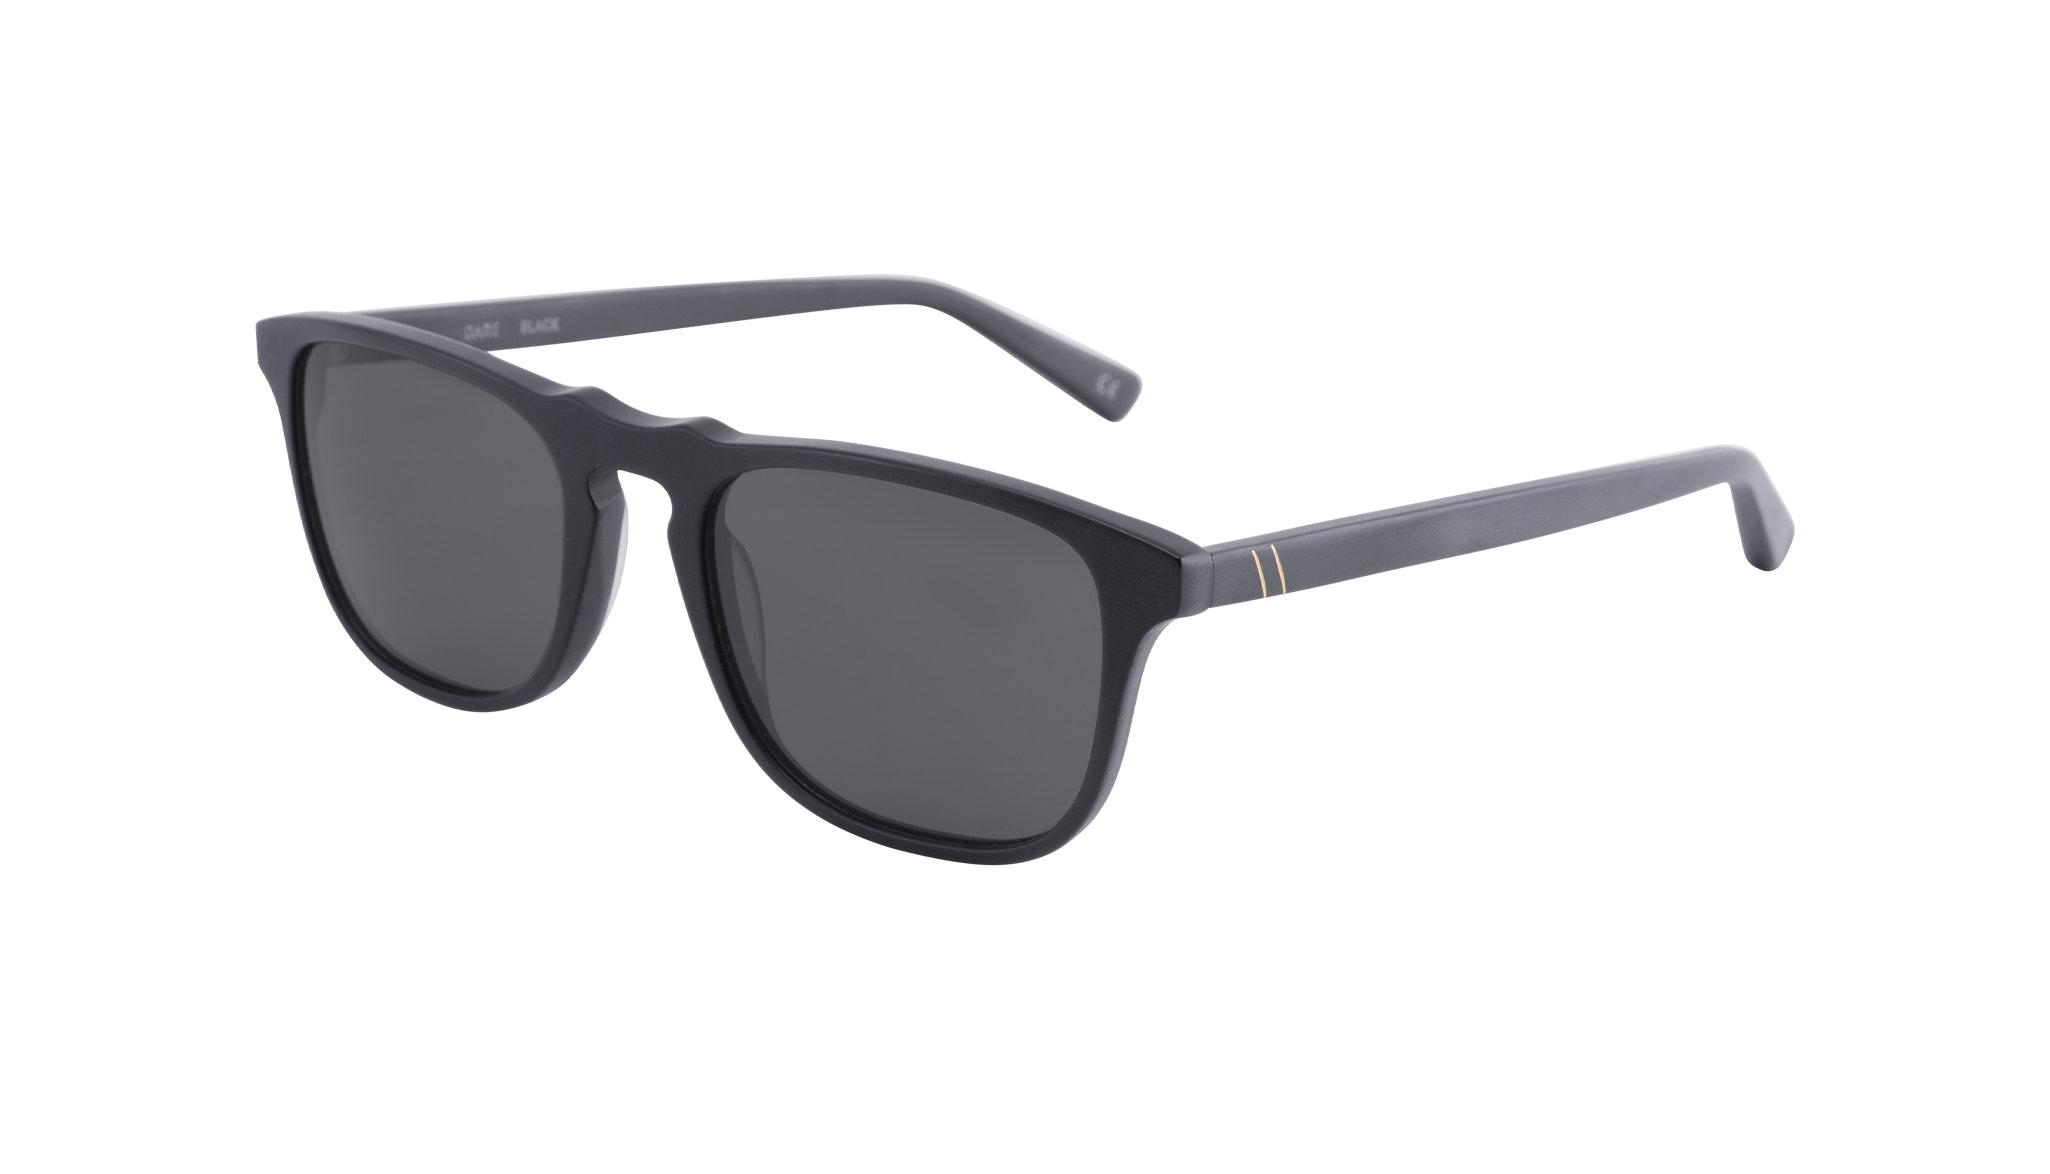 Affordable Fashion Glasses Rectangle Sunglasses Men Dare Matte Black Tilt